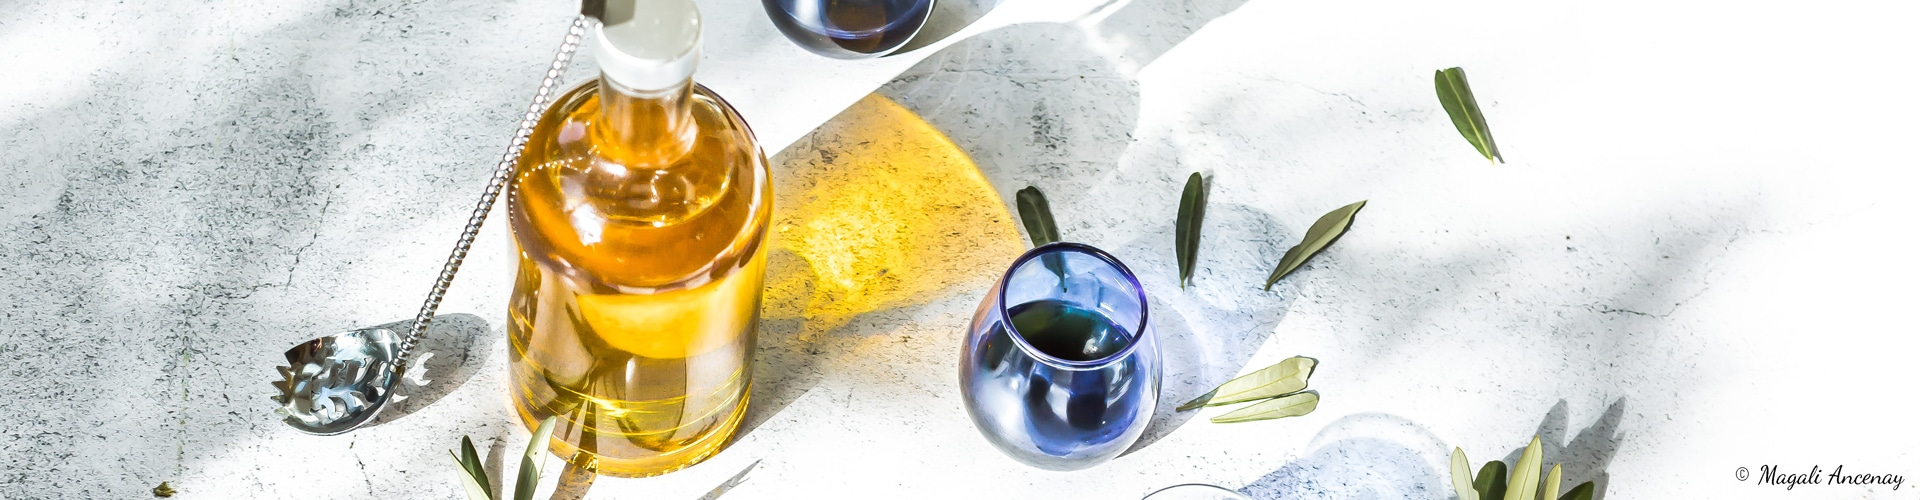 huile-olive-degustation-les-bases-comment-deguster